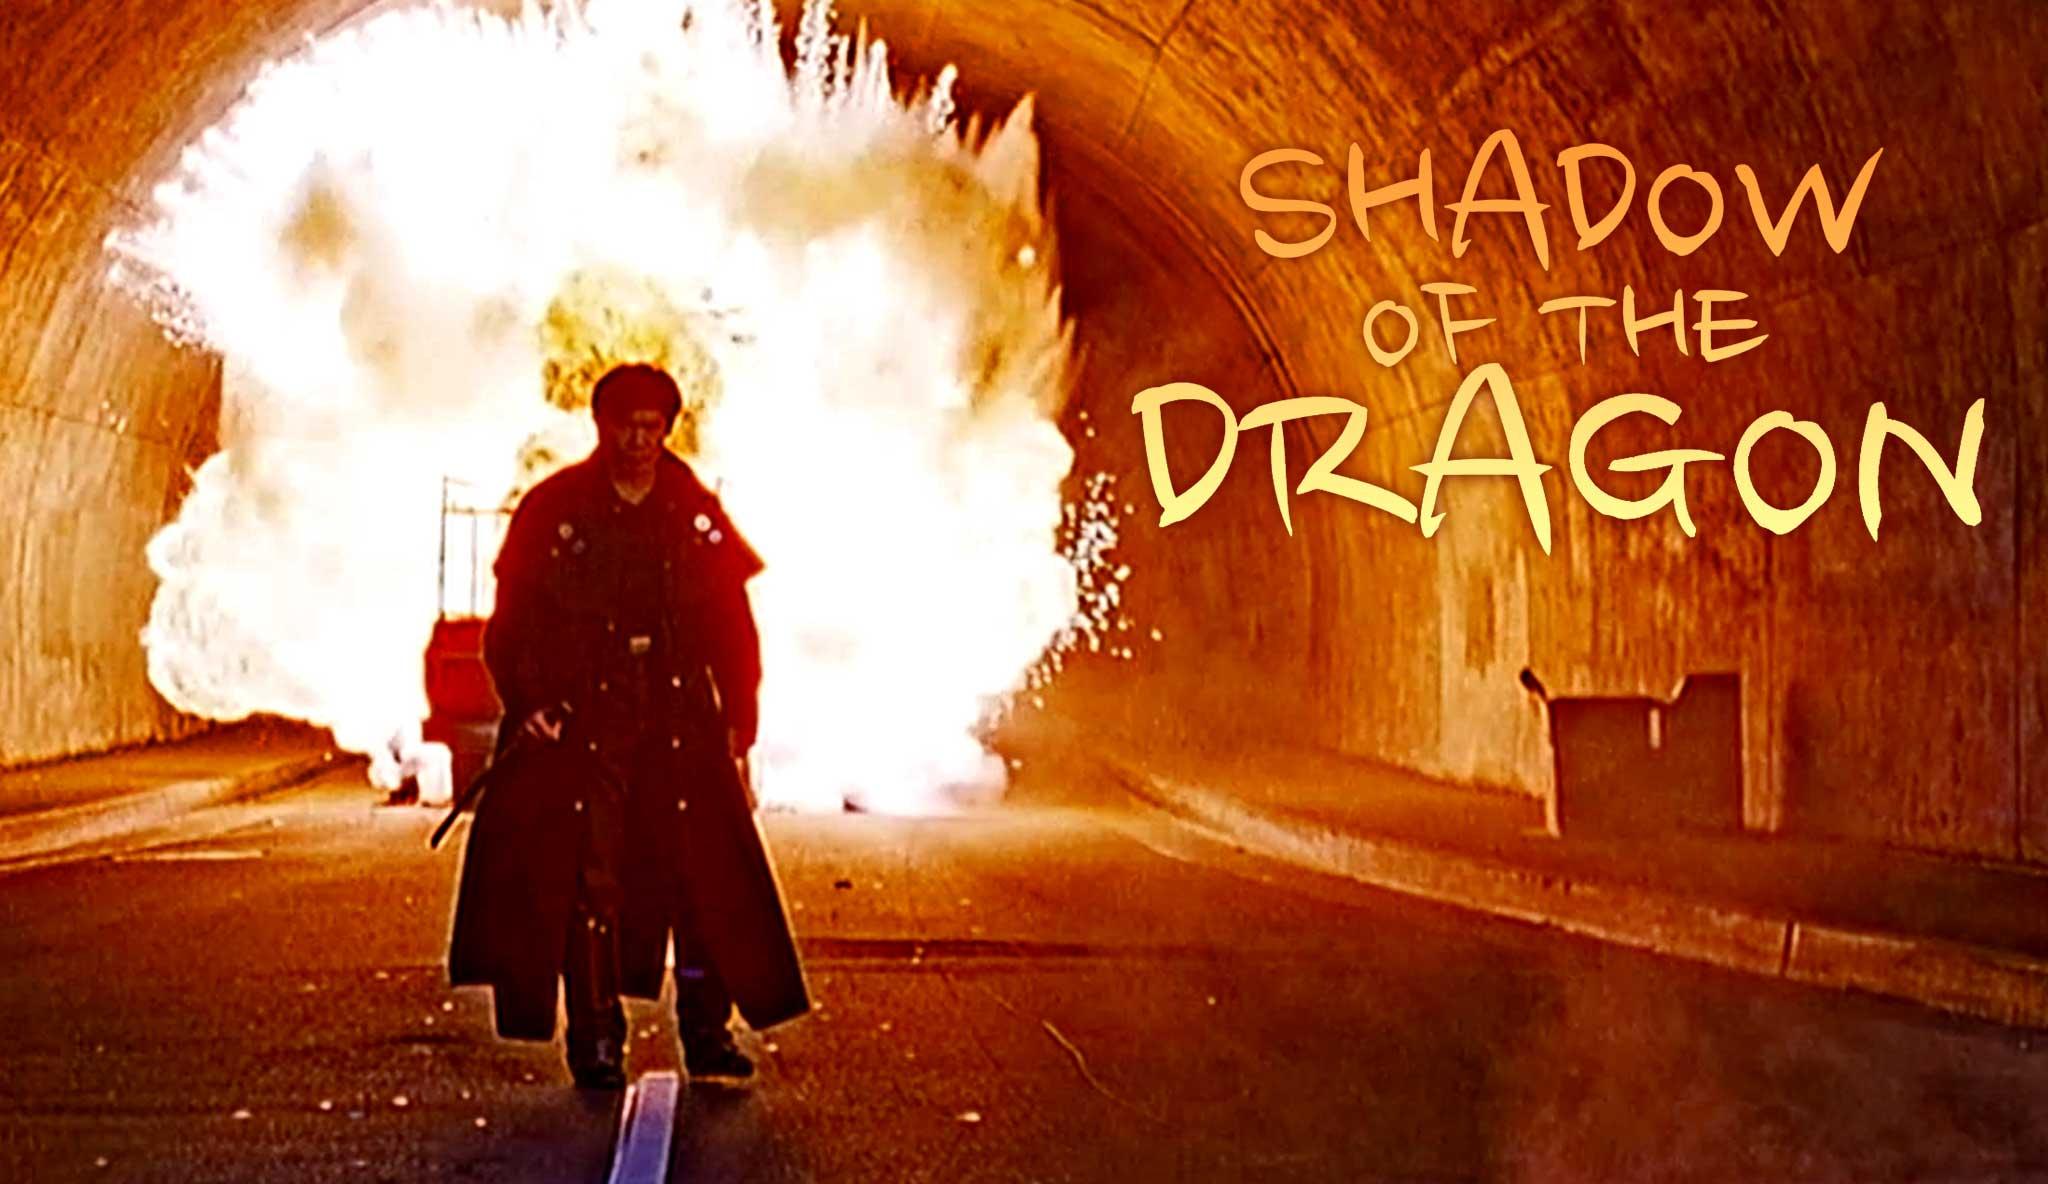 shadow-of-the-dragon\header.jpg